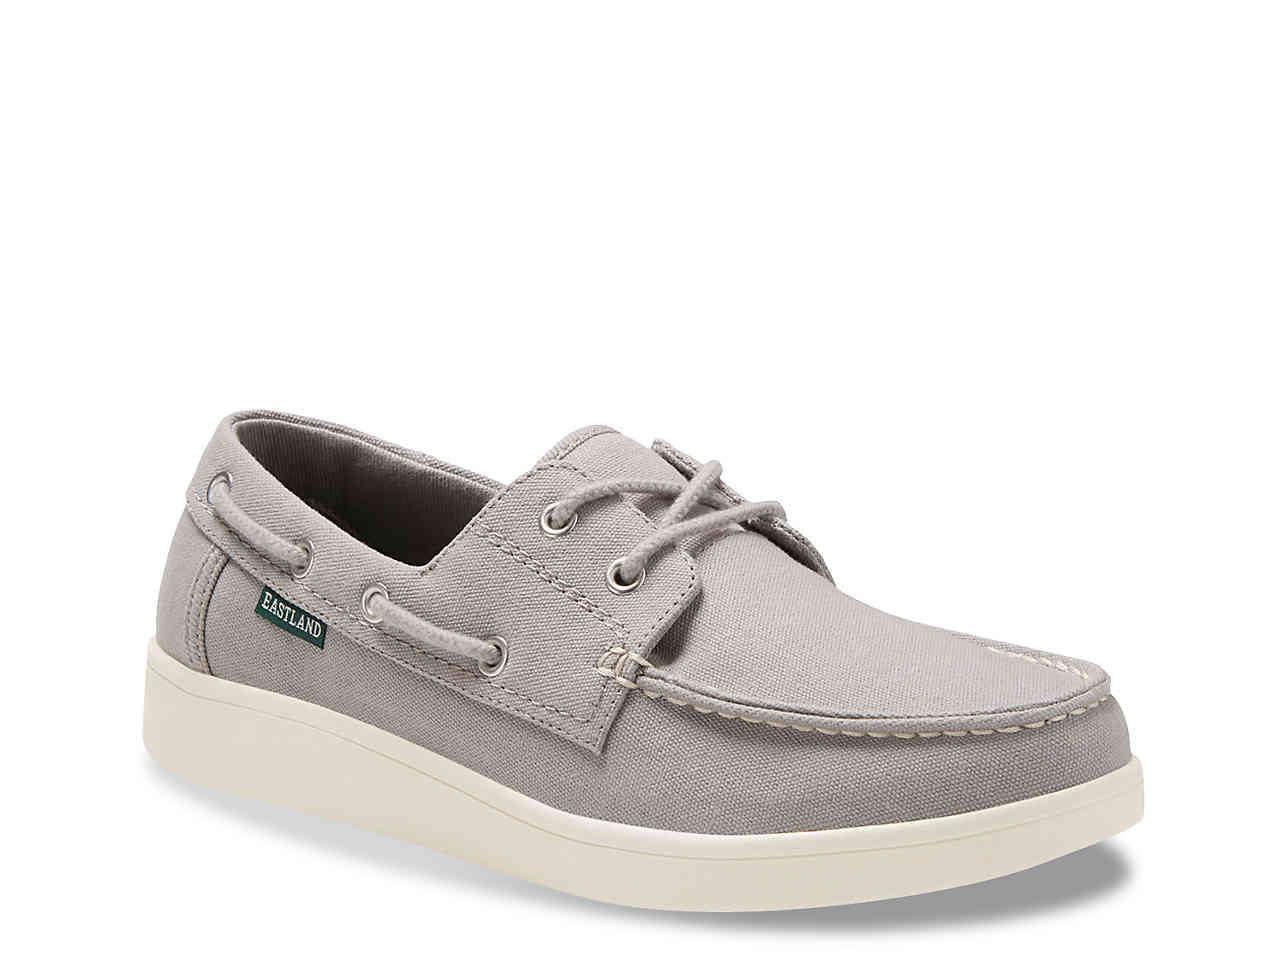 Eastland® Popham Boat Shoe